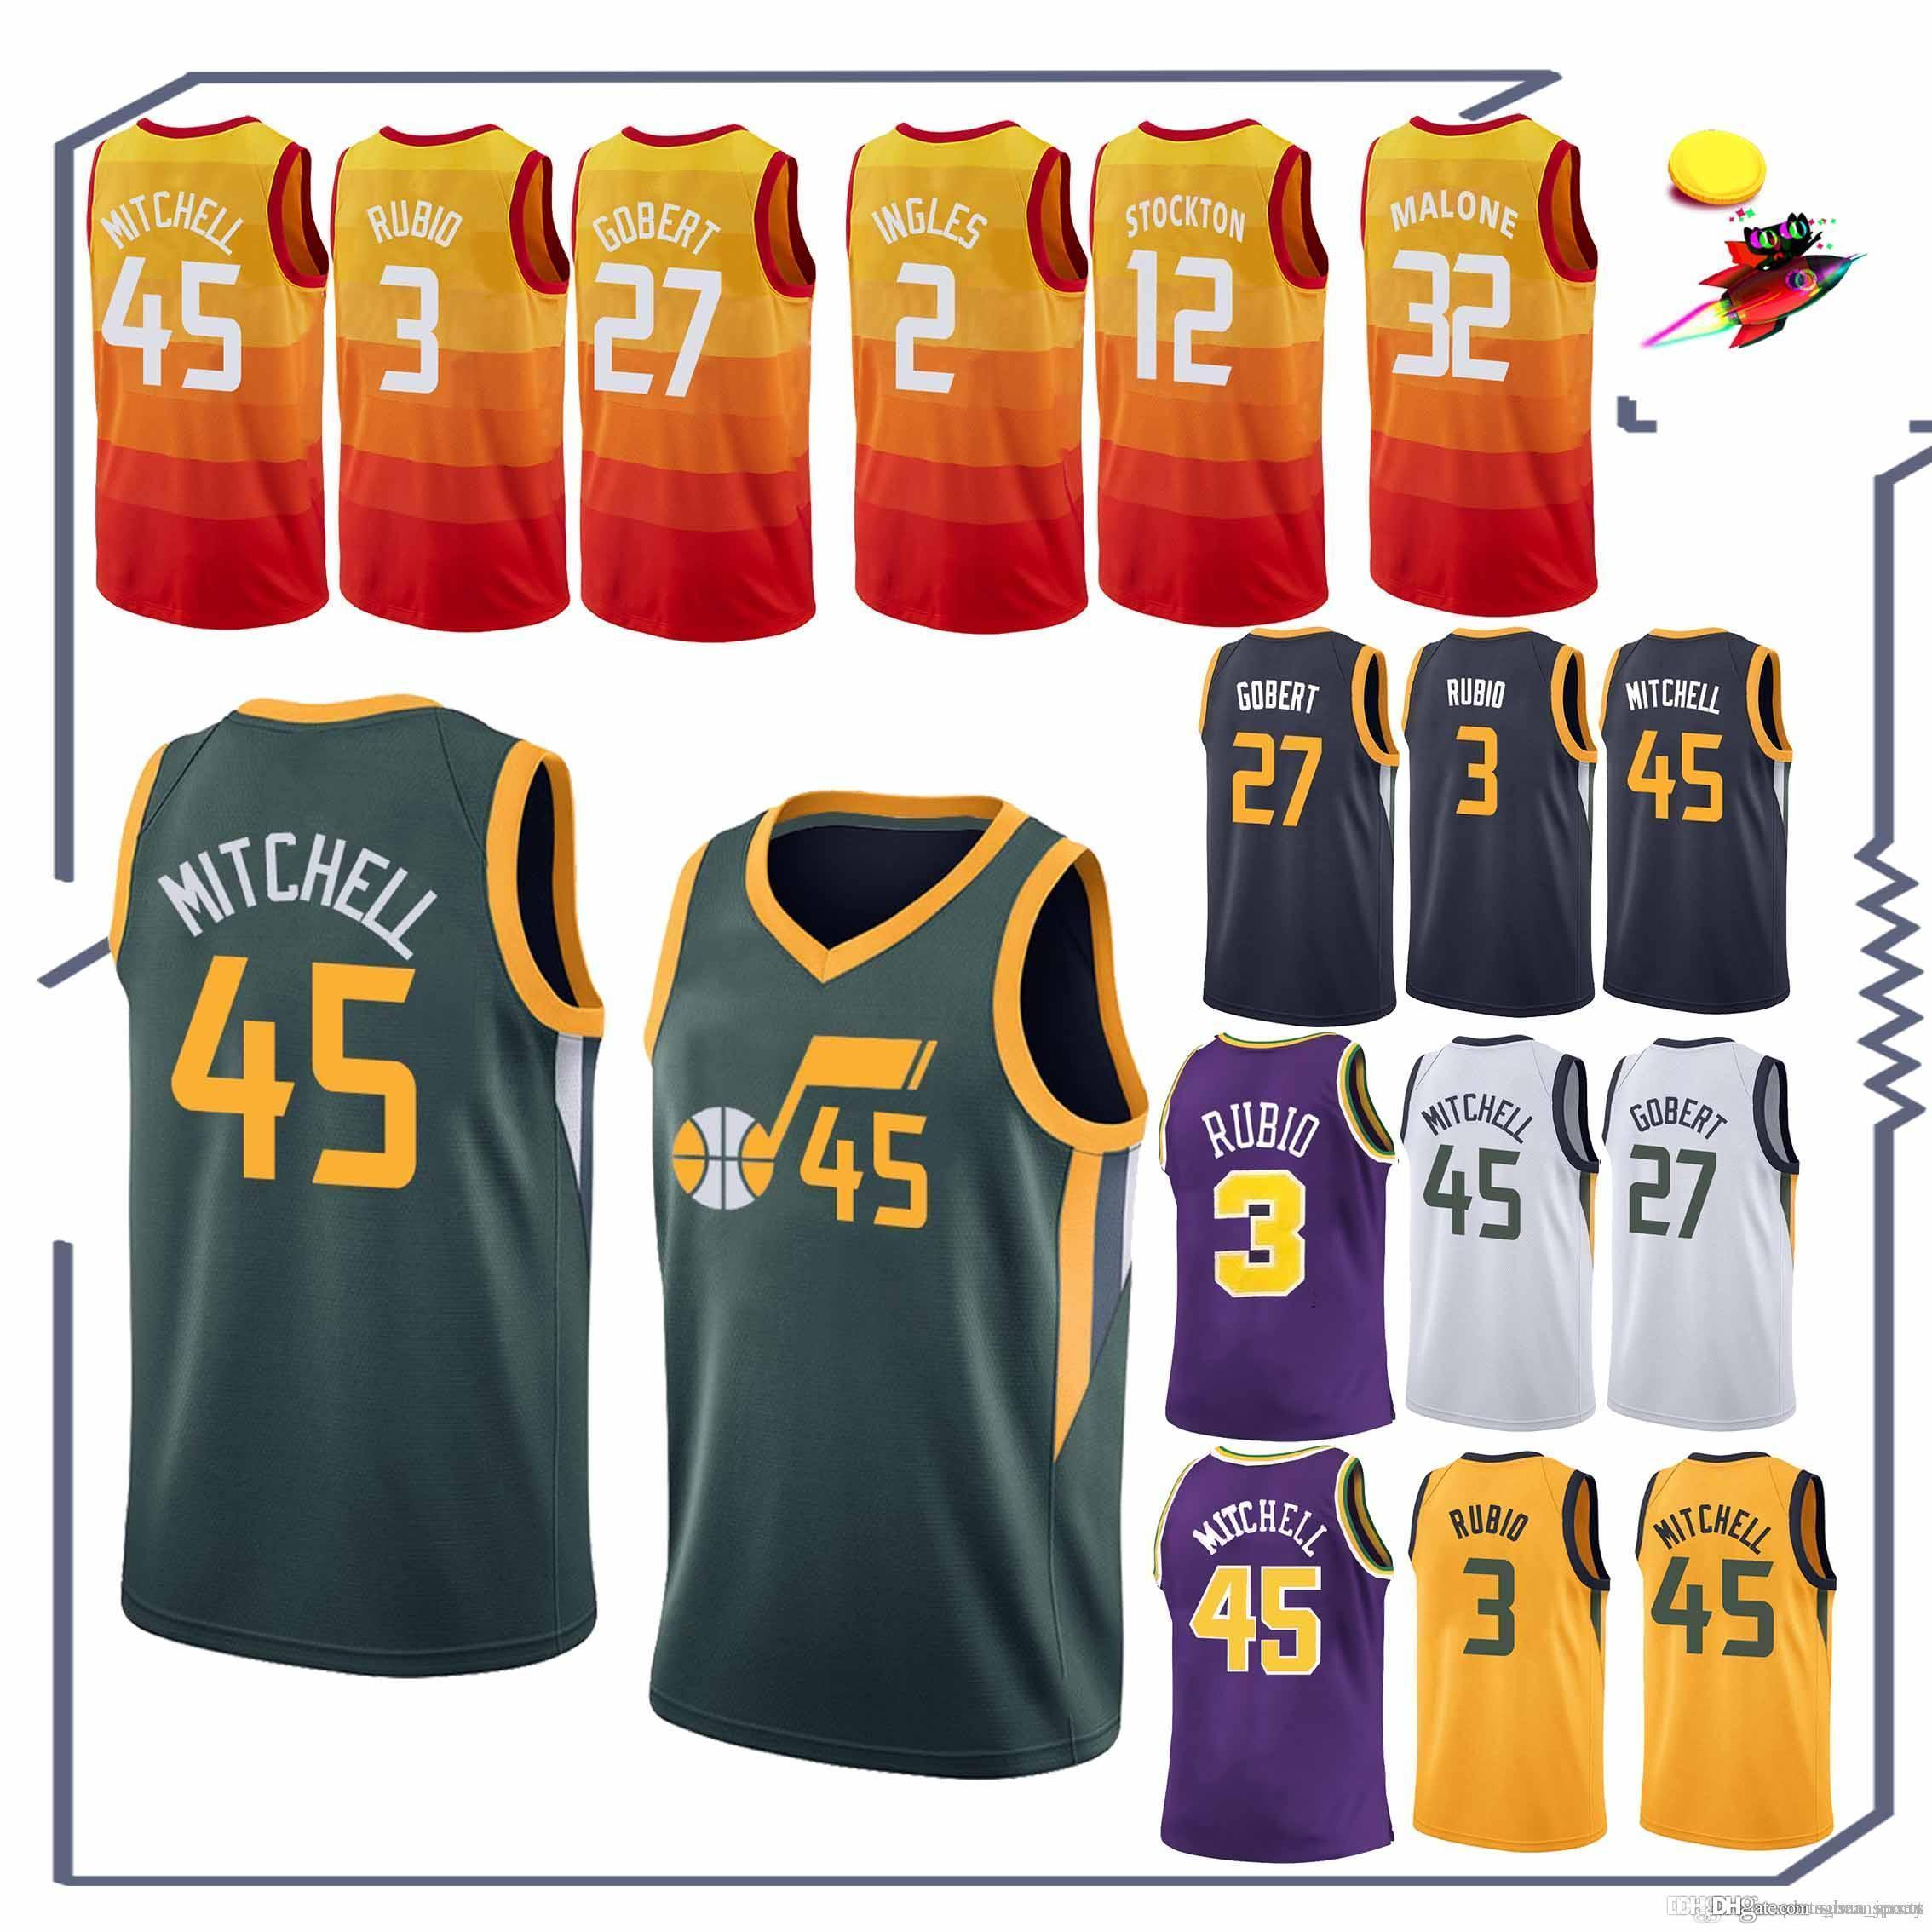 low priced d5407 81411 Utah jerseys 45 Donovan Mitchell 3 Ricky Rubio 24 Grayson Allen 2 Joe  Ingles 27 Rudy Gobert tracksuit jersey